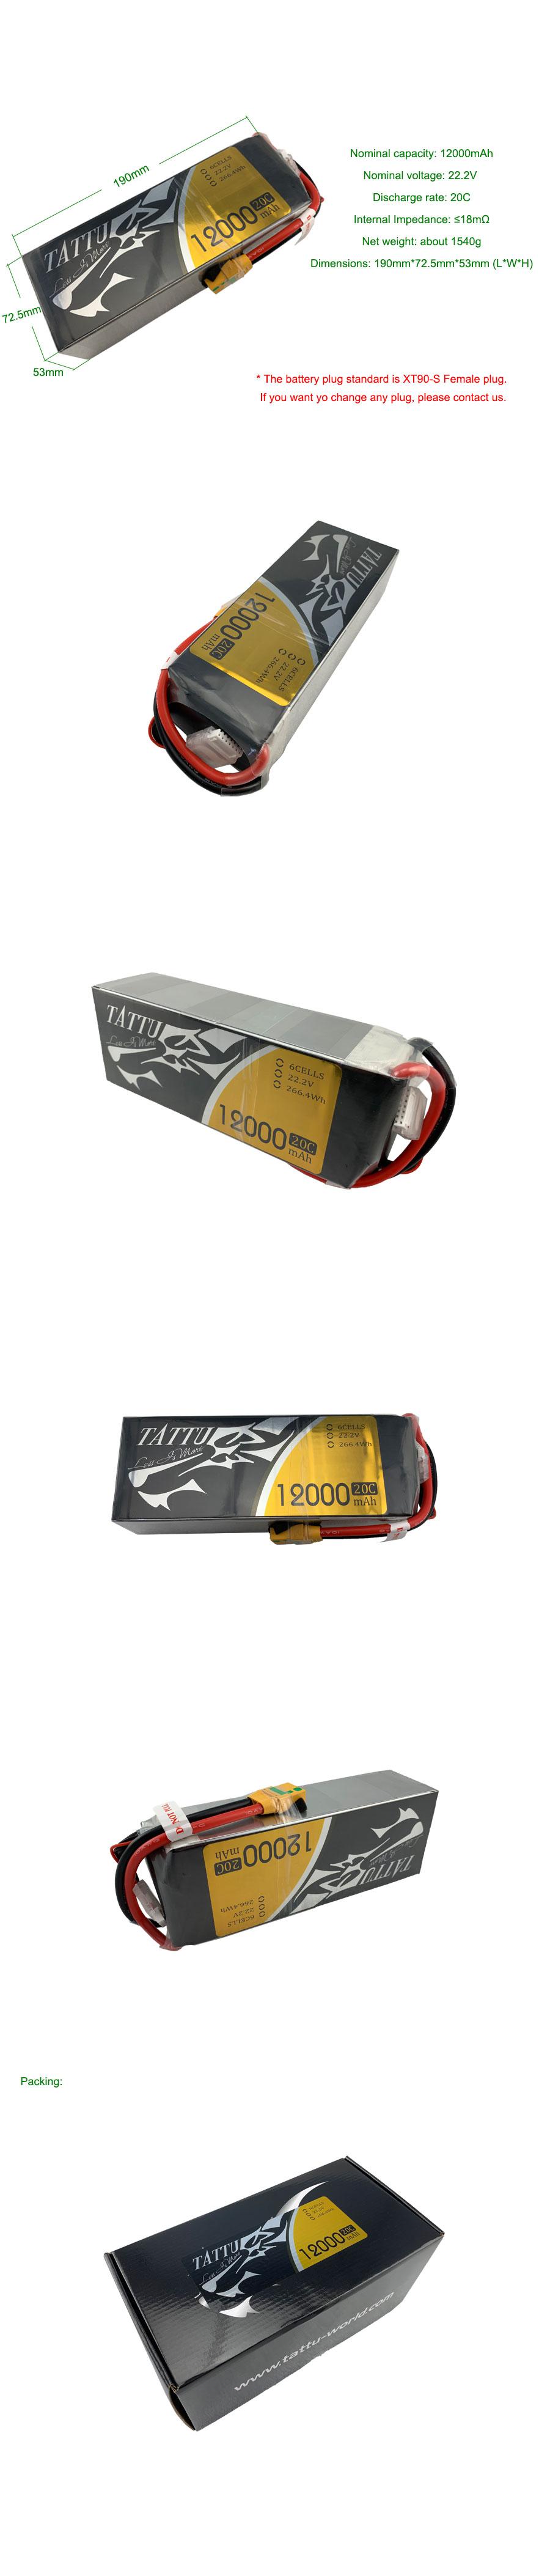 professional uav battery, 20c lipo, 12000mah battery, 12000mah lipo 6s, 6s 22.2v lipo, uav battery, 12000mah 22.2v battery pack